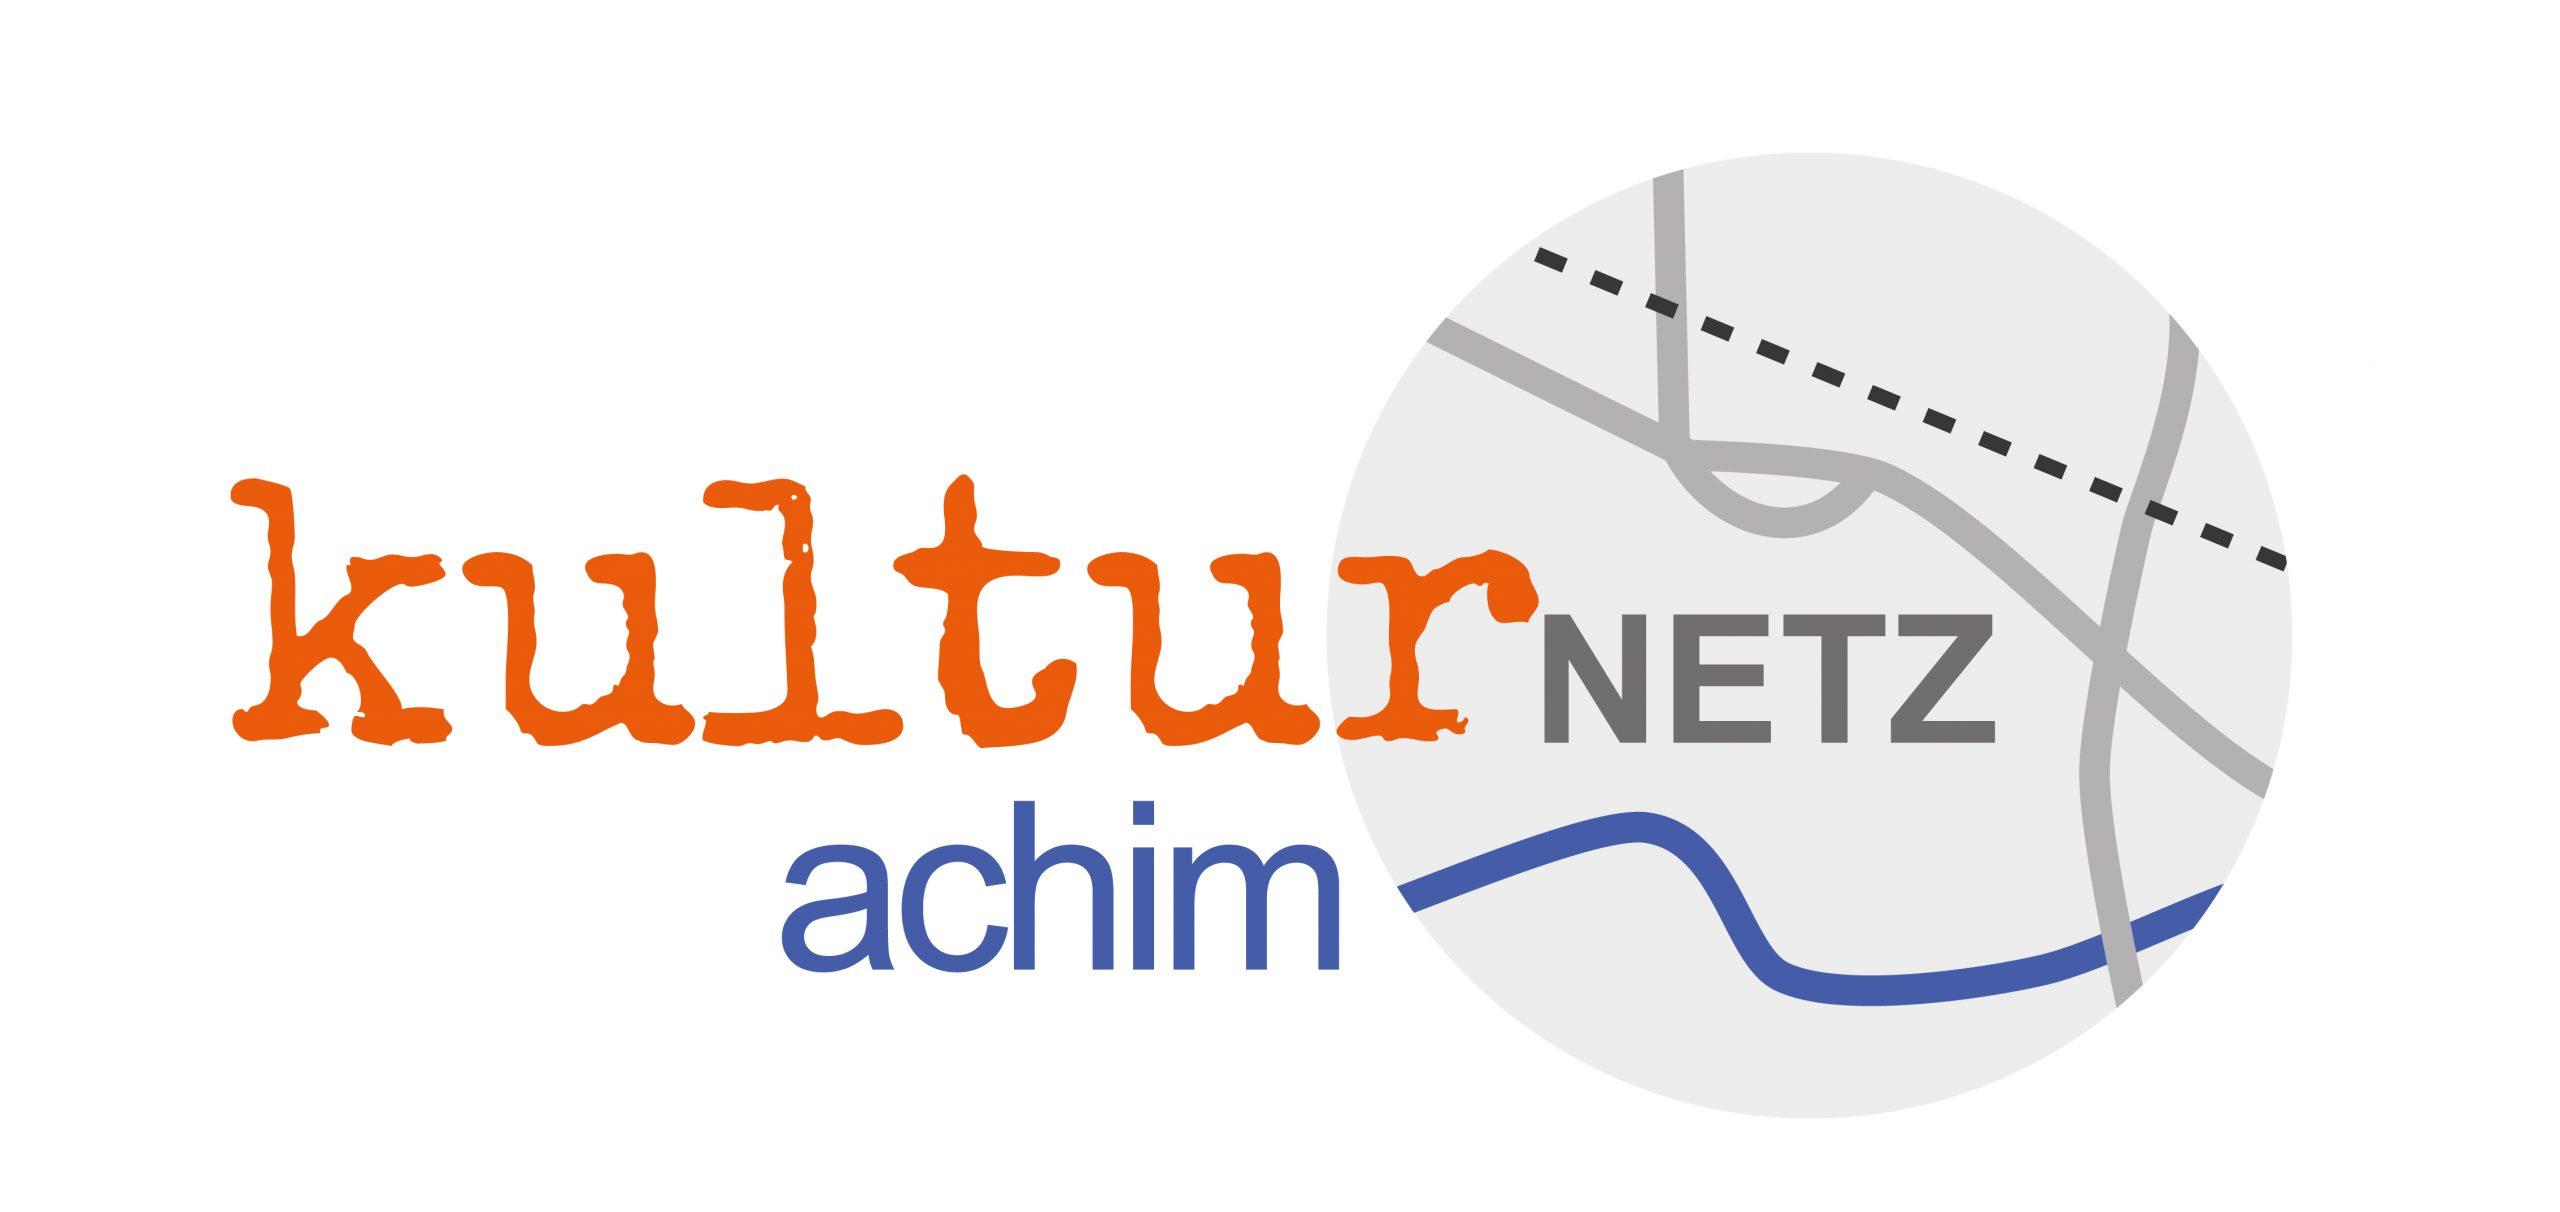 cit research Logo der Firma Sachtleben GmbH